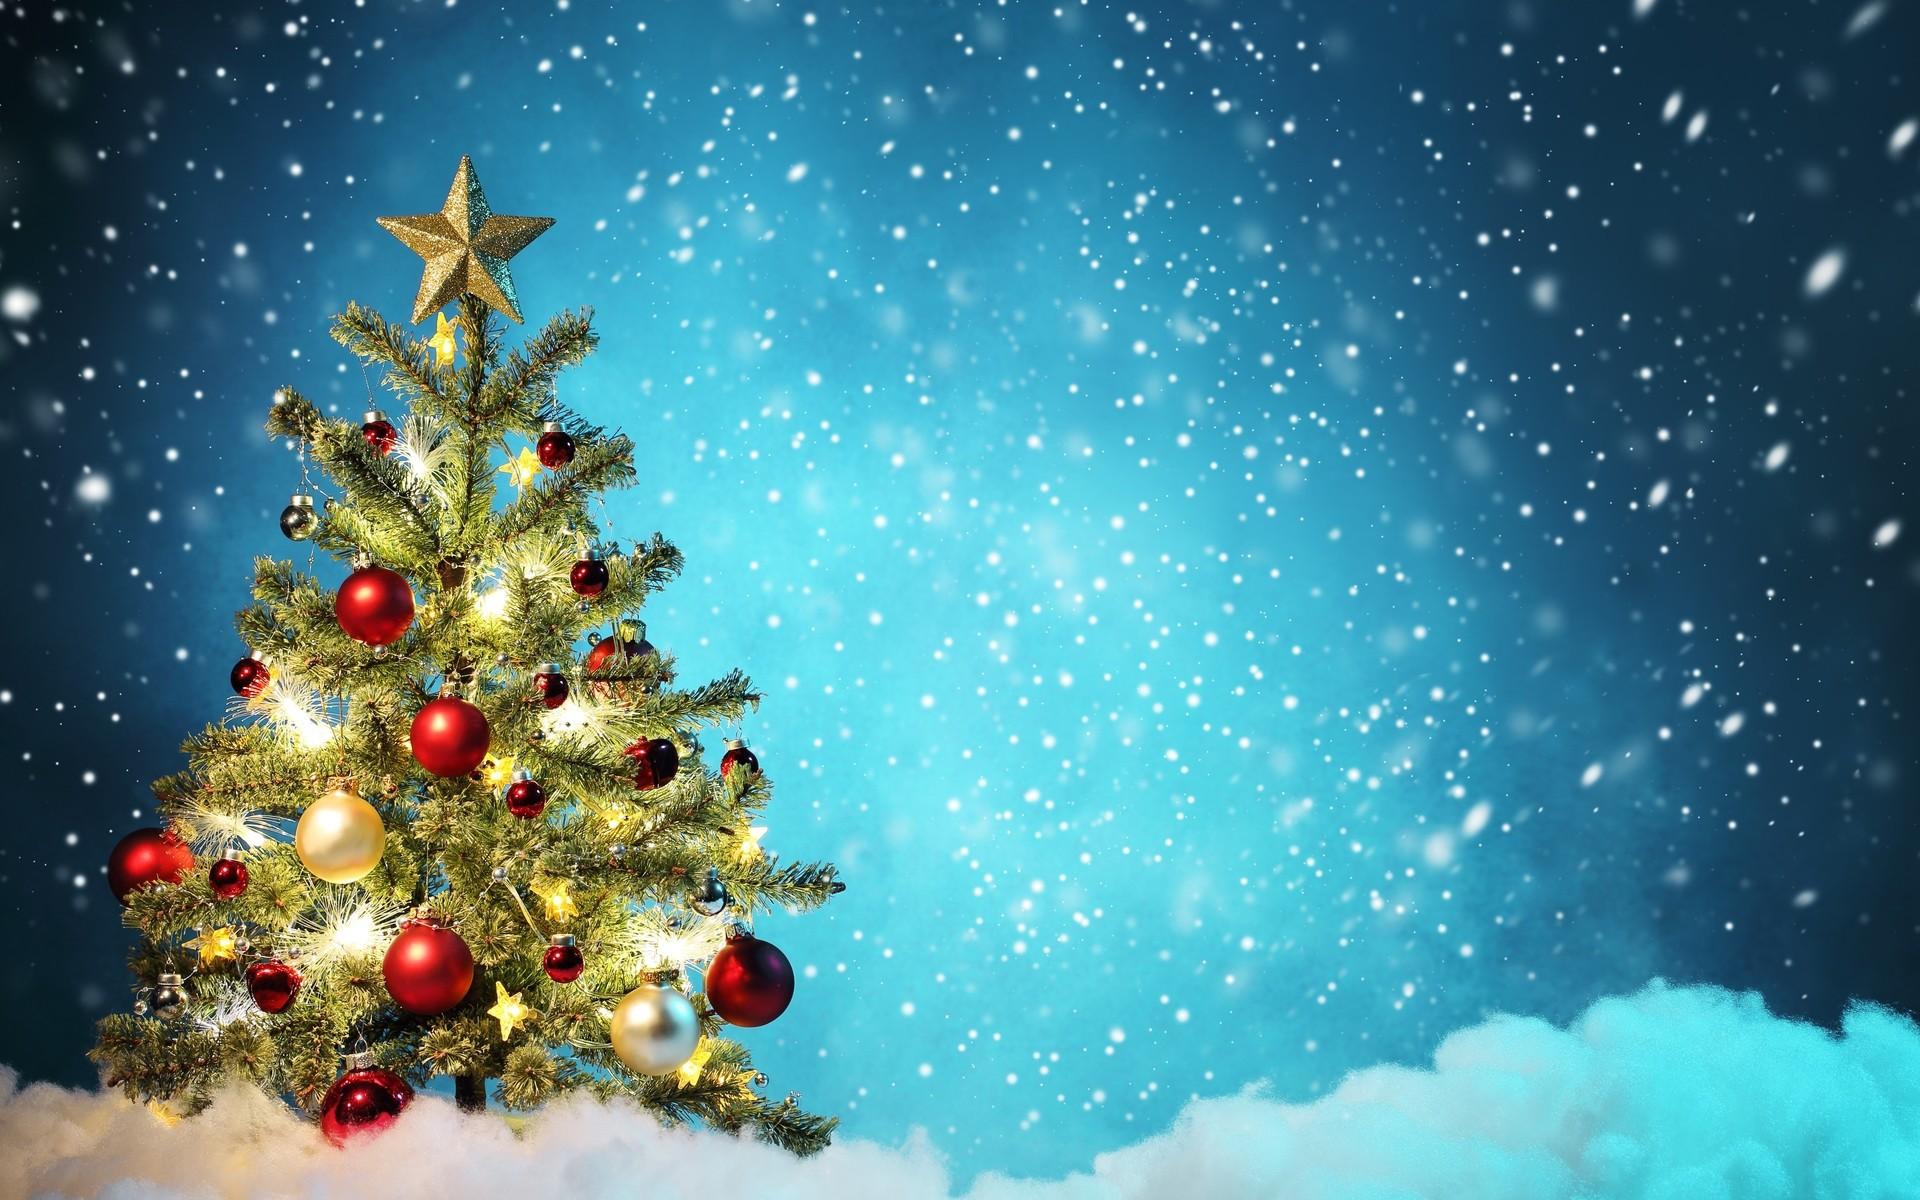 Desktop Christmas Wallpapers Backgrounds 48 Images